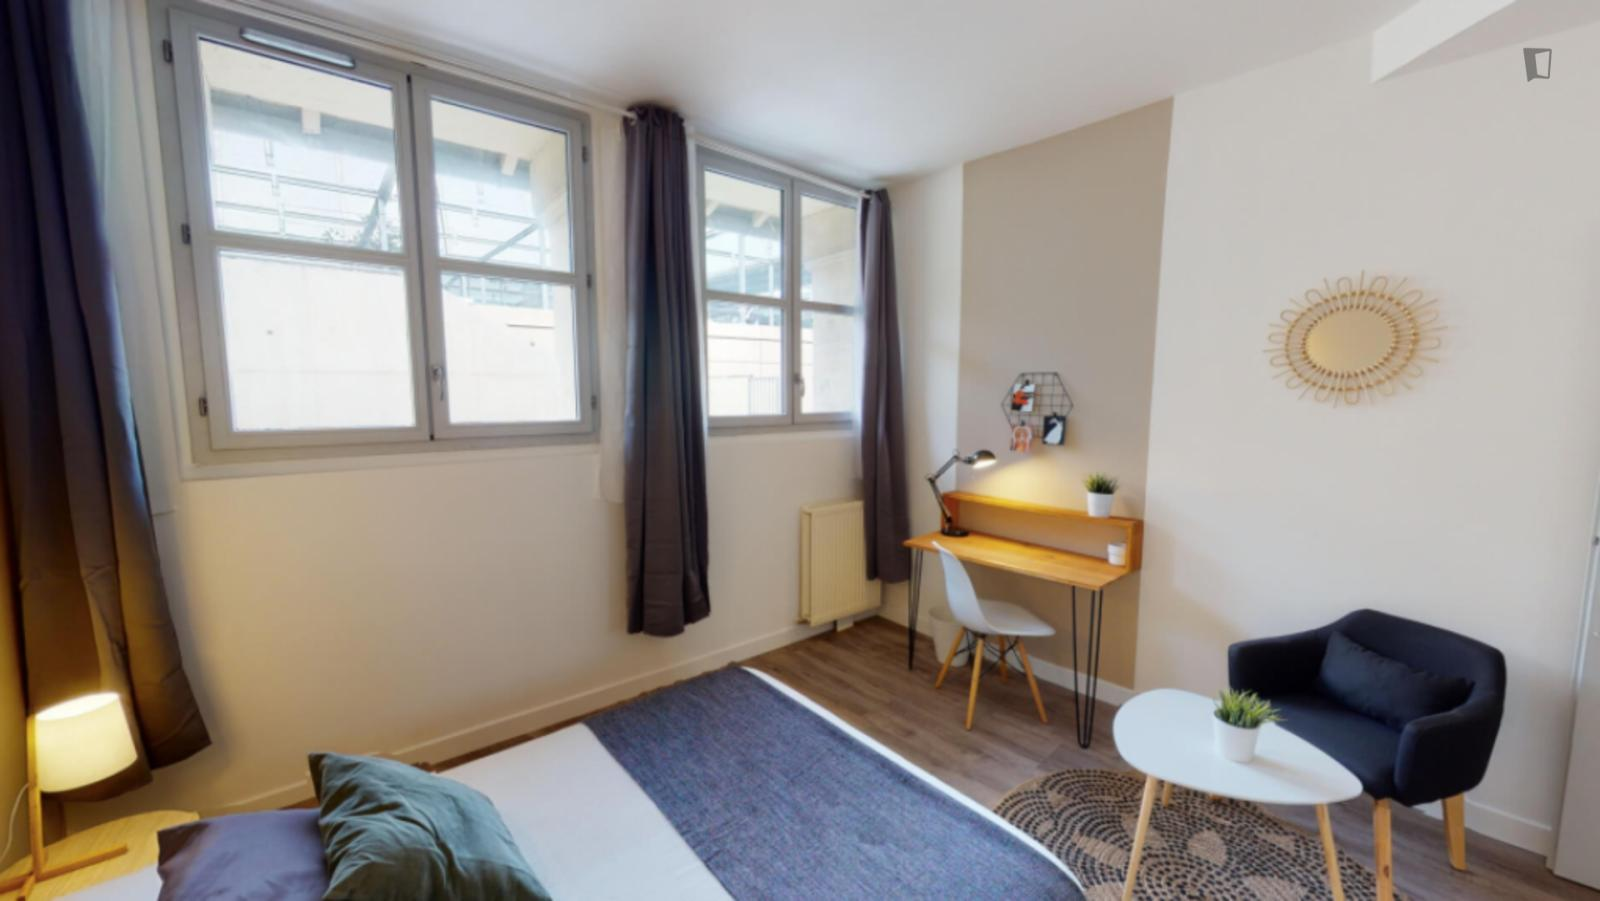 Rue des Deux-Ponts, Montpellier, FR-34 - 544 EUR/ month